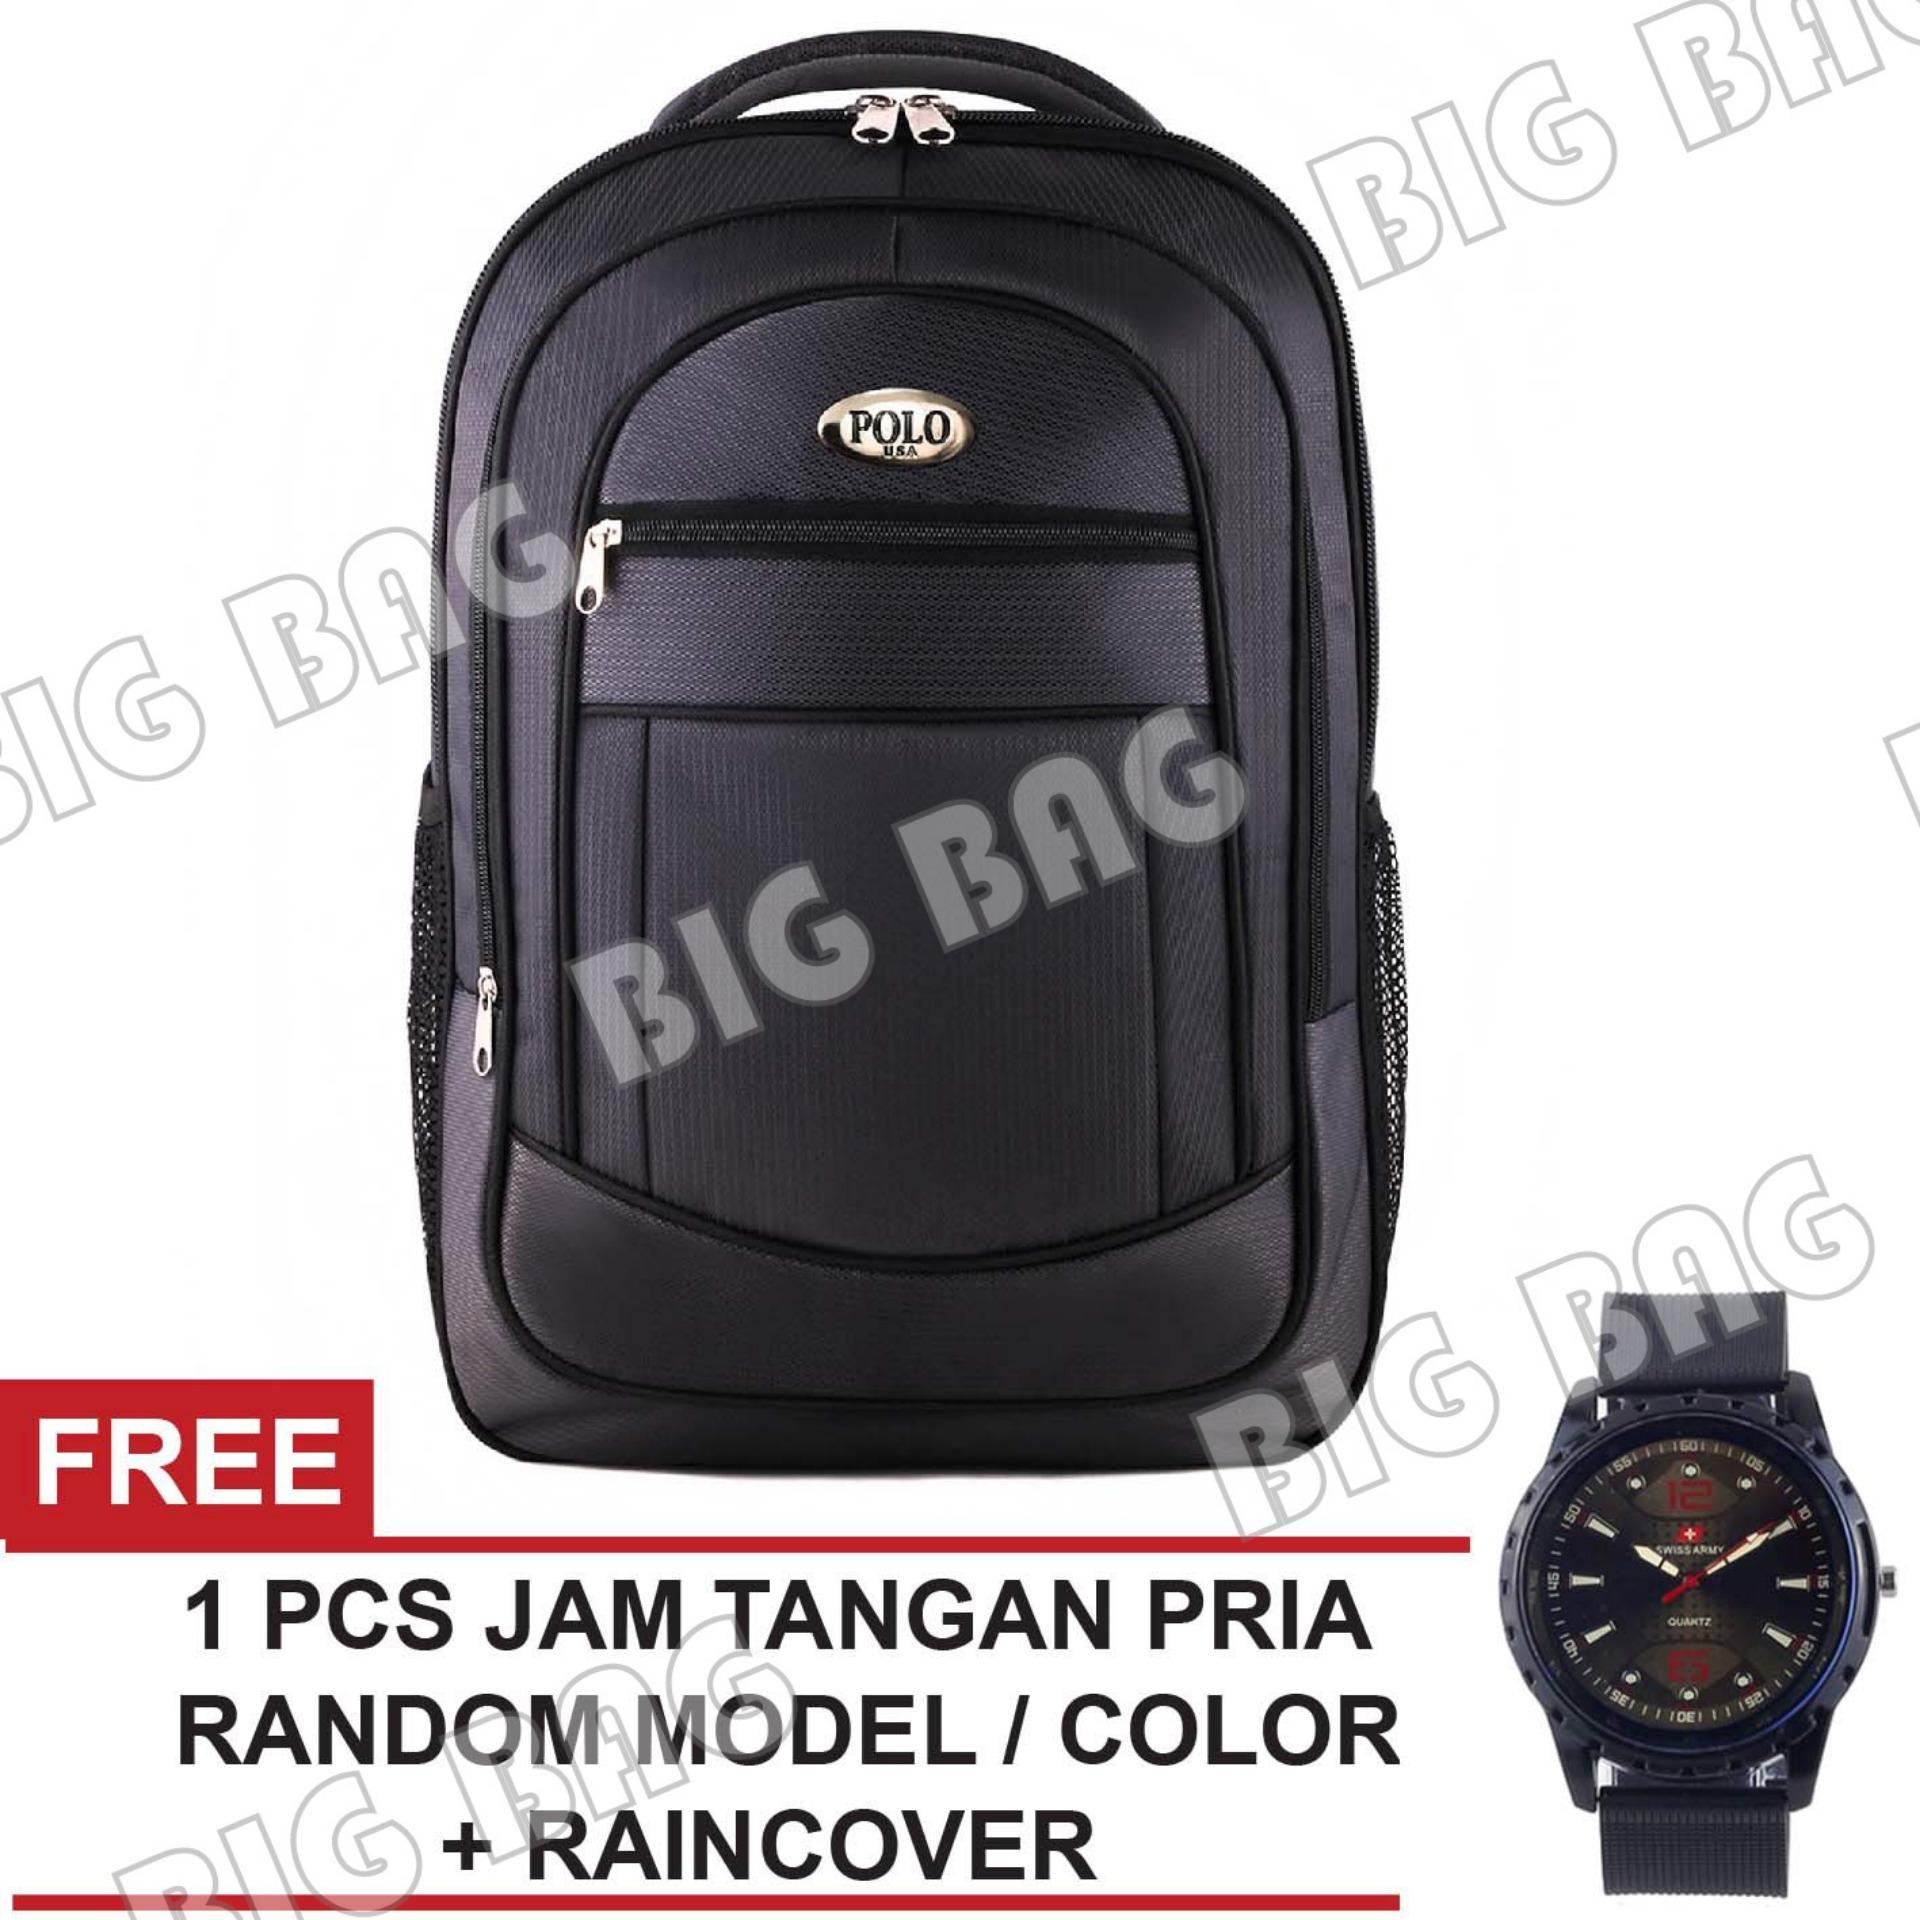 Tas Ransel Polo USA Tiger Snake Tas Laptop Backpack - Grey + Raincover + FREE Jam Tangan Pria ( RANDOM MODEL + COLOR ) Tas Pria Tas Kerja Tas Sekolah Tas Fashion Pria